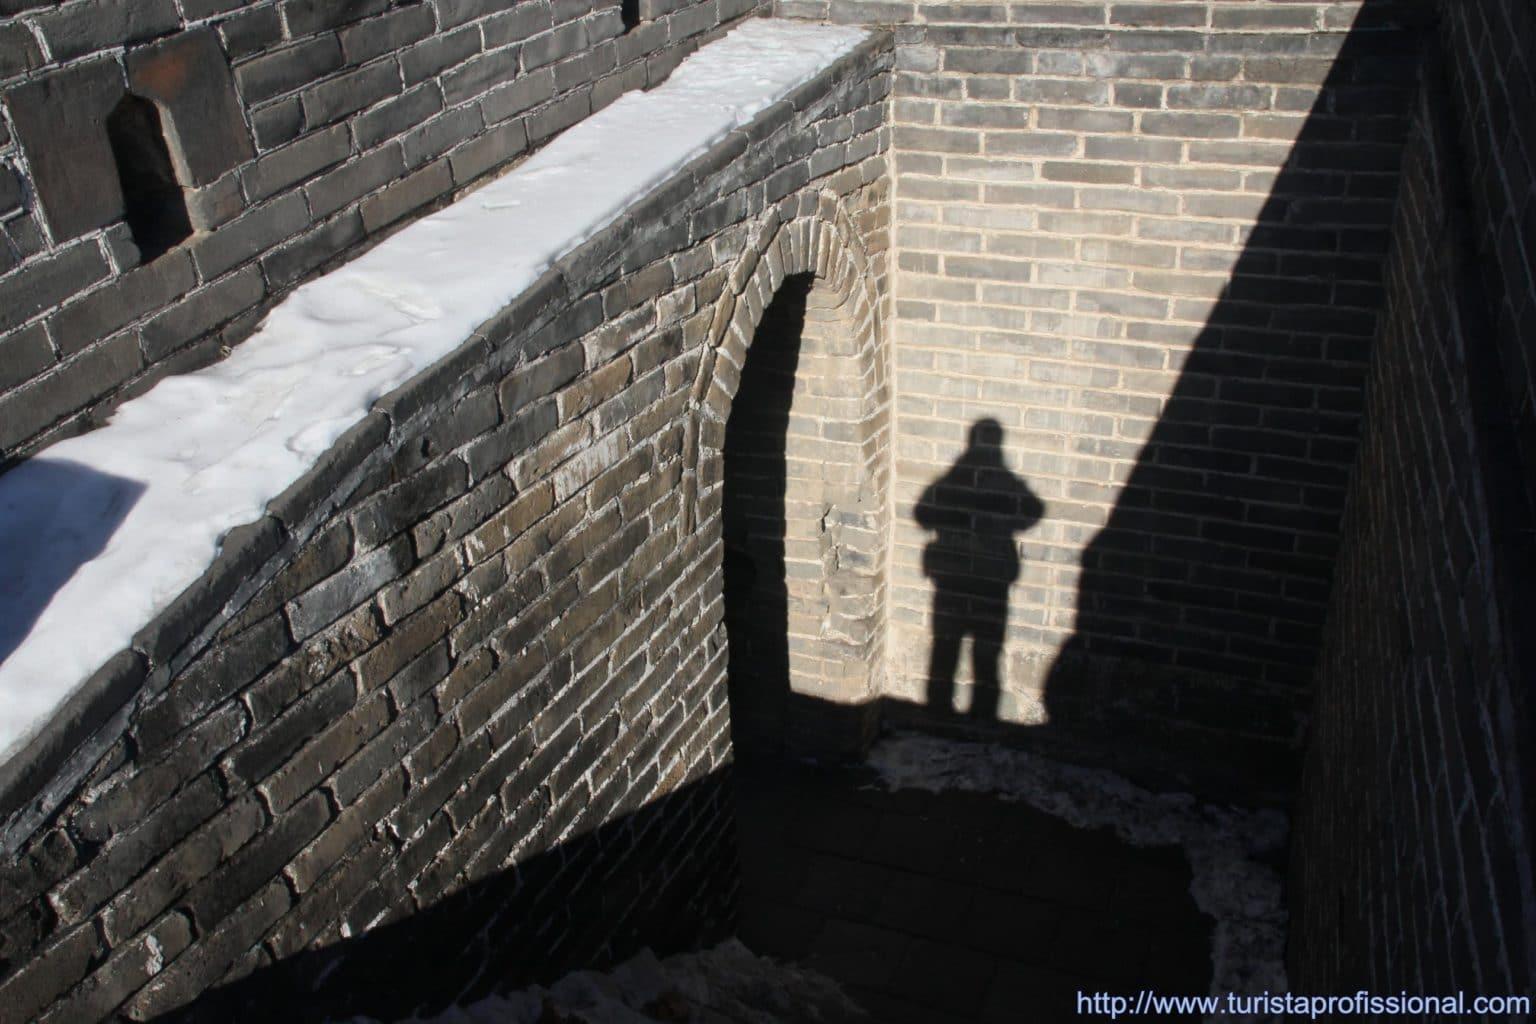 Muralha da China 8 - Olhares | Muralha da China